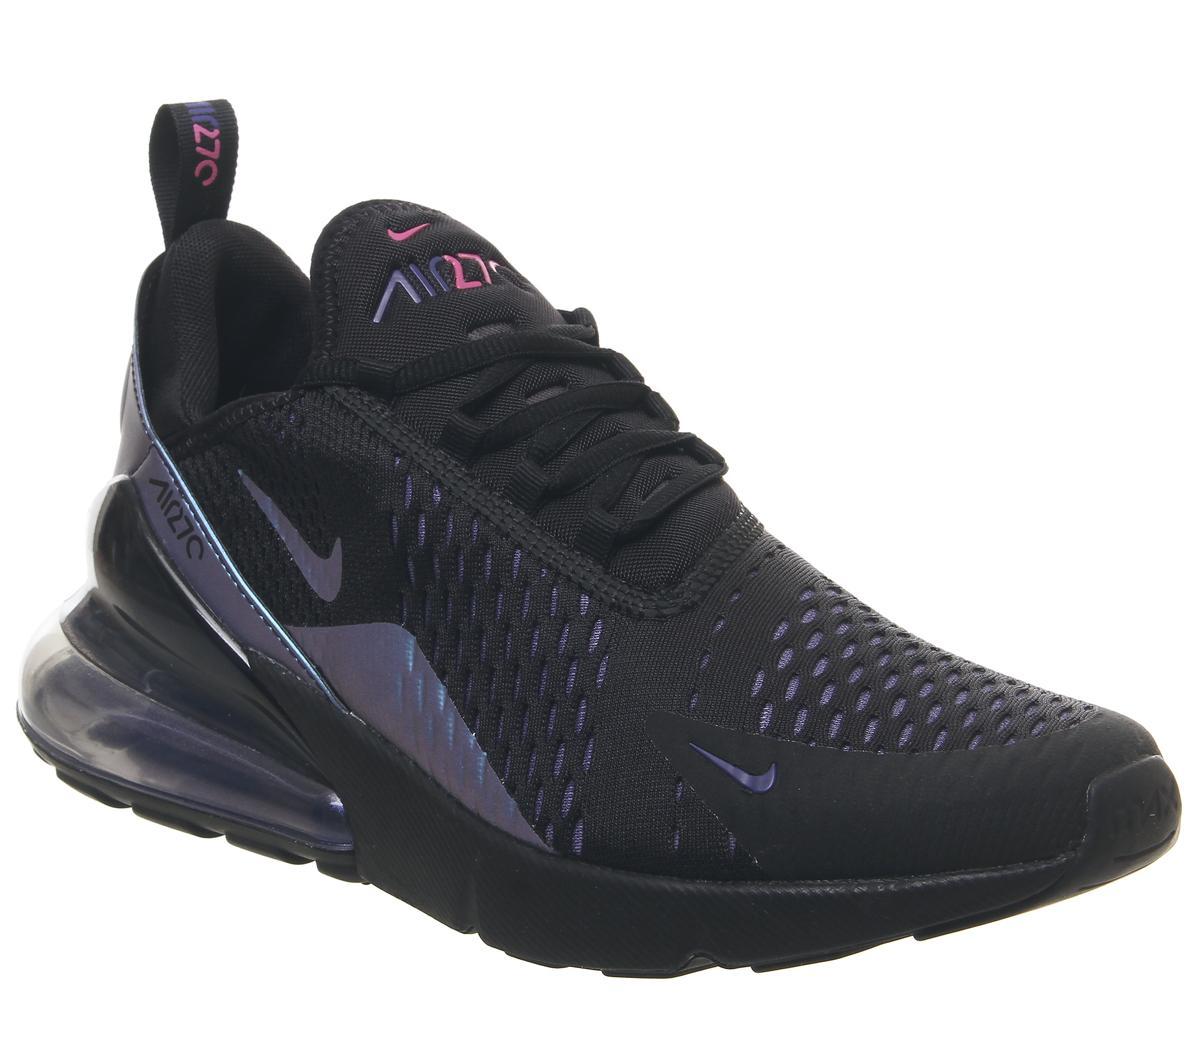 Nike Air Max 270 Trainers Black Laser Fuchsia Regency Purple